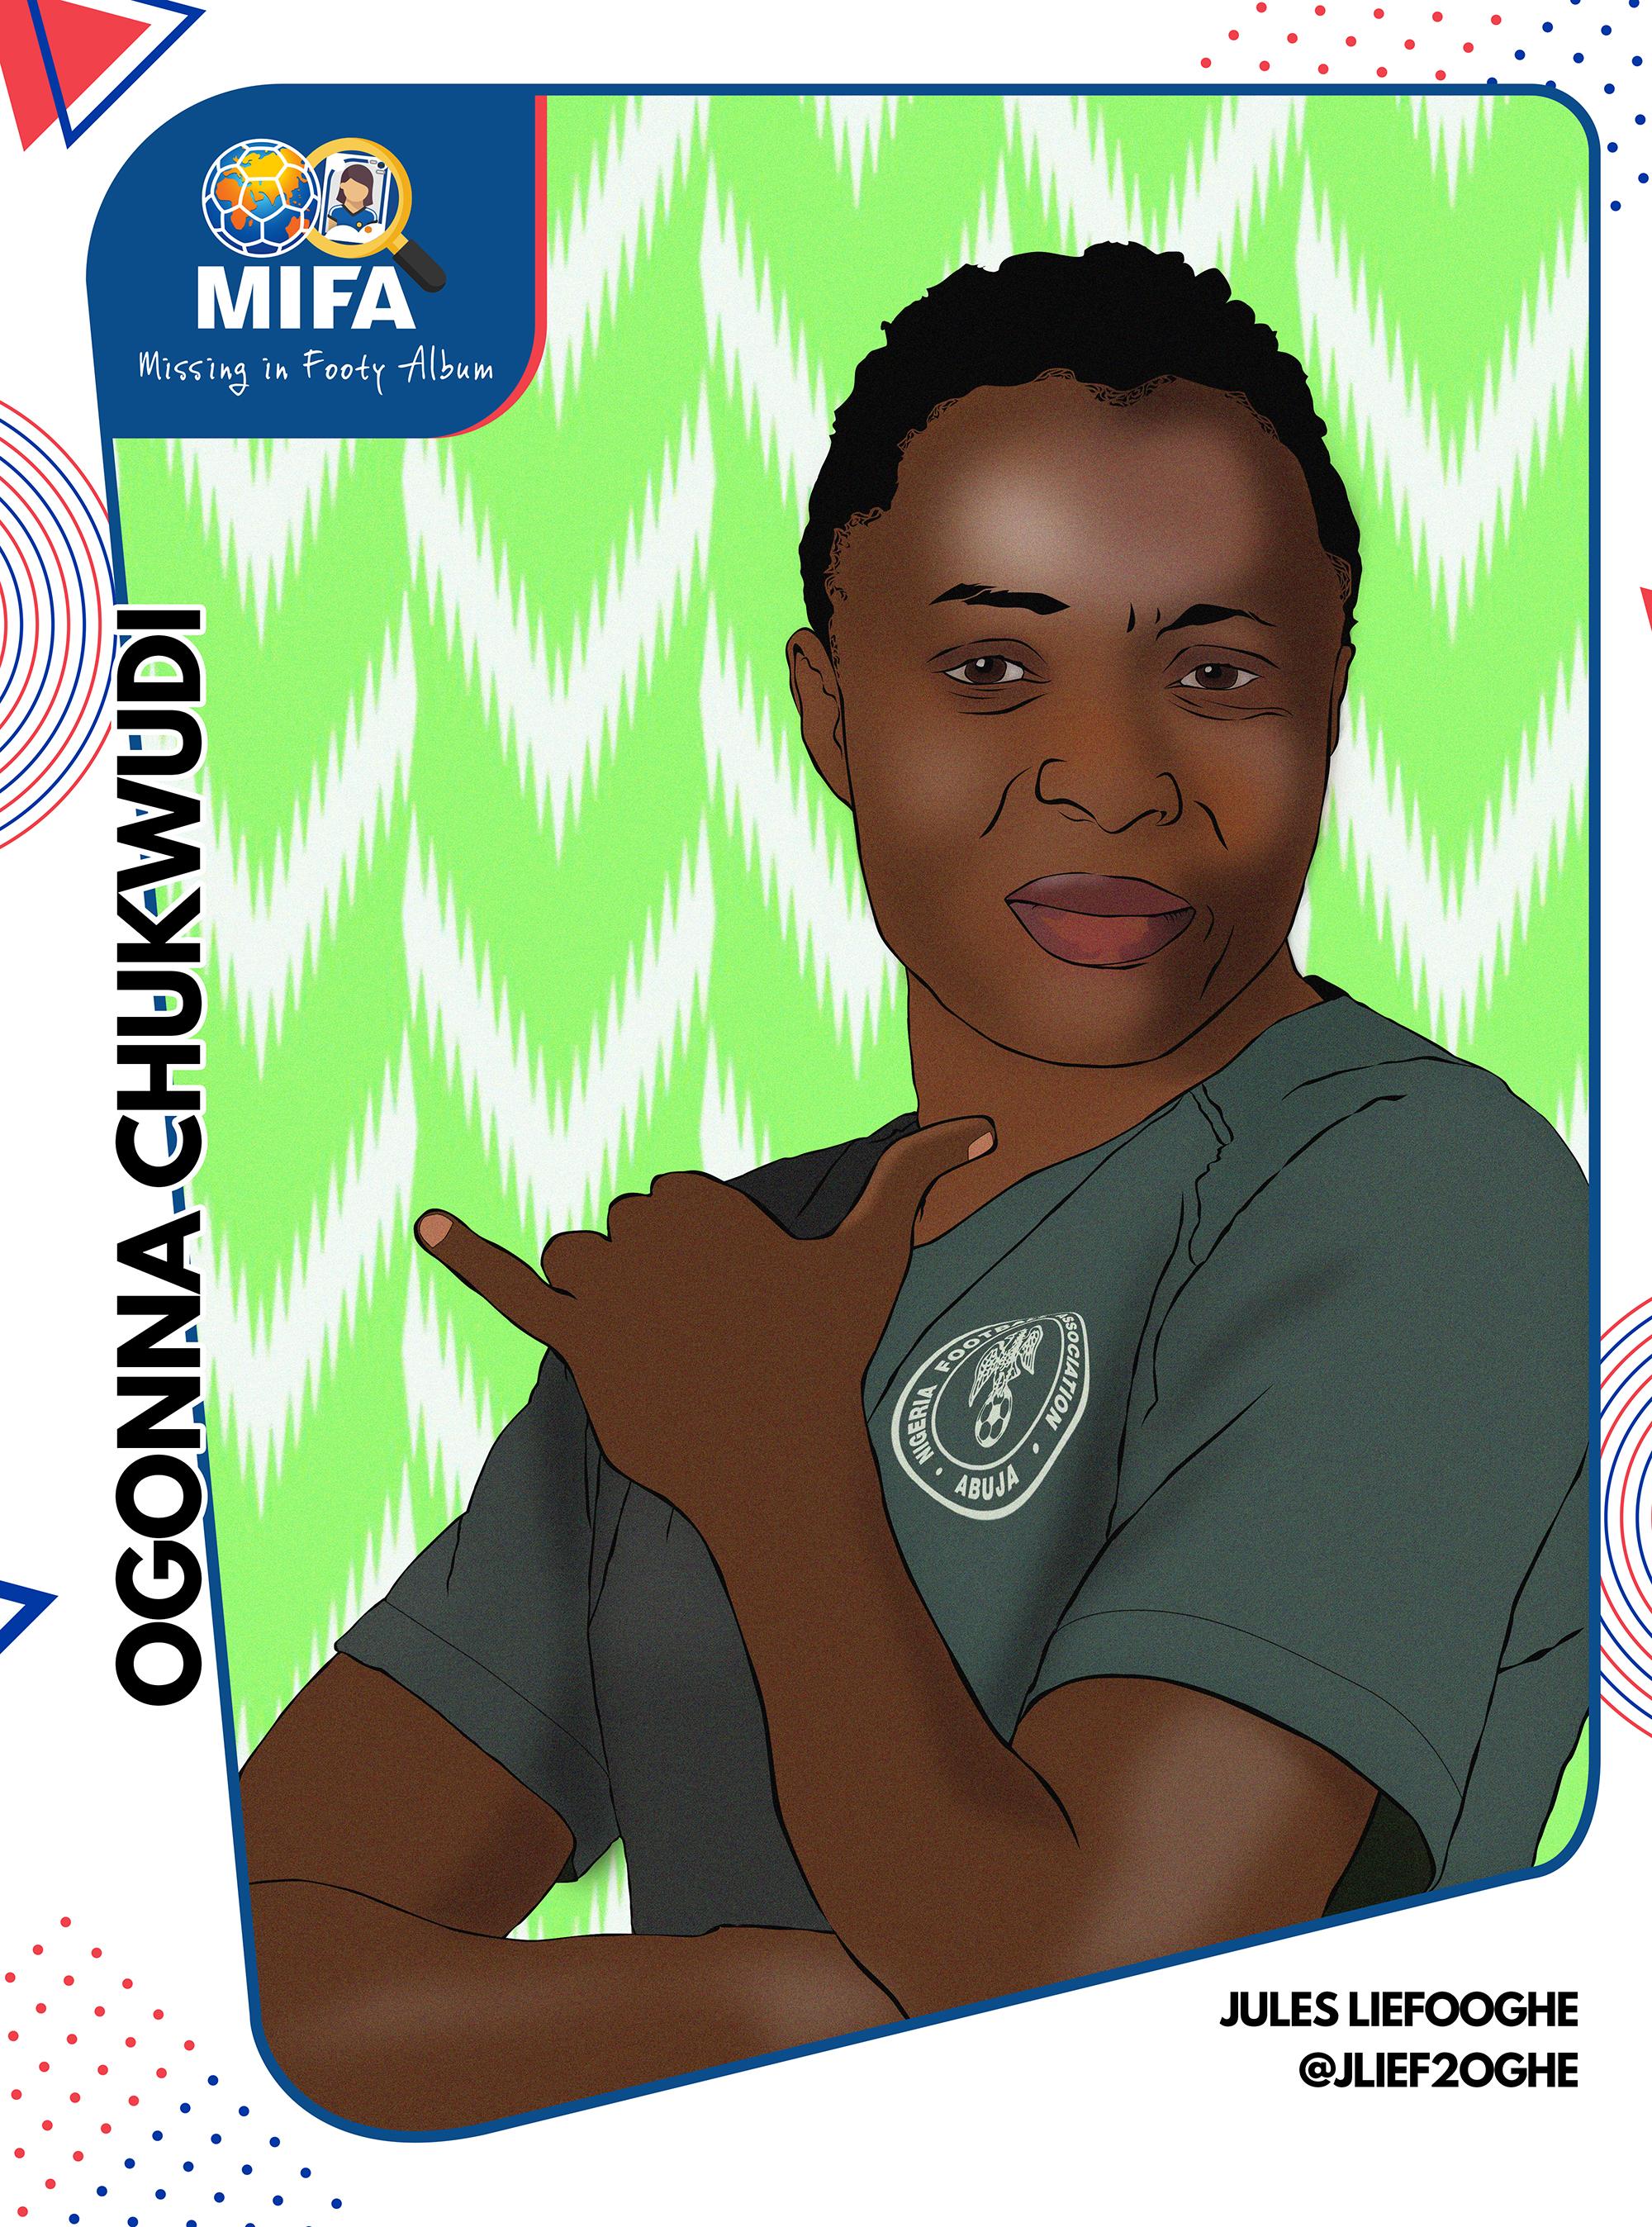 MIFA 2019 Ogonna Chukwudi.jpg